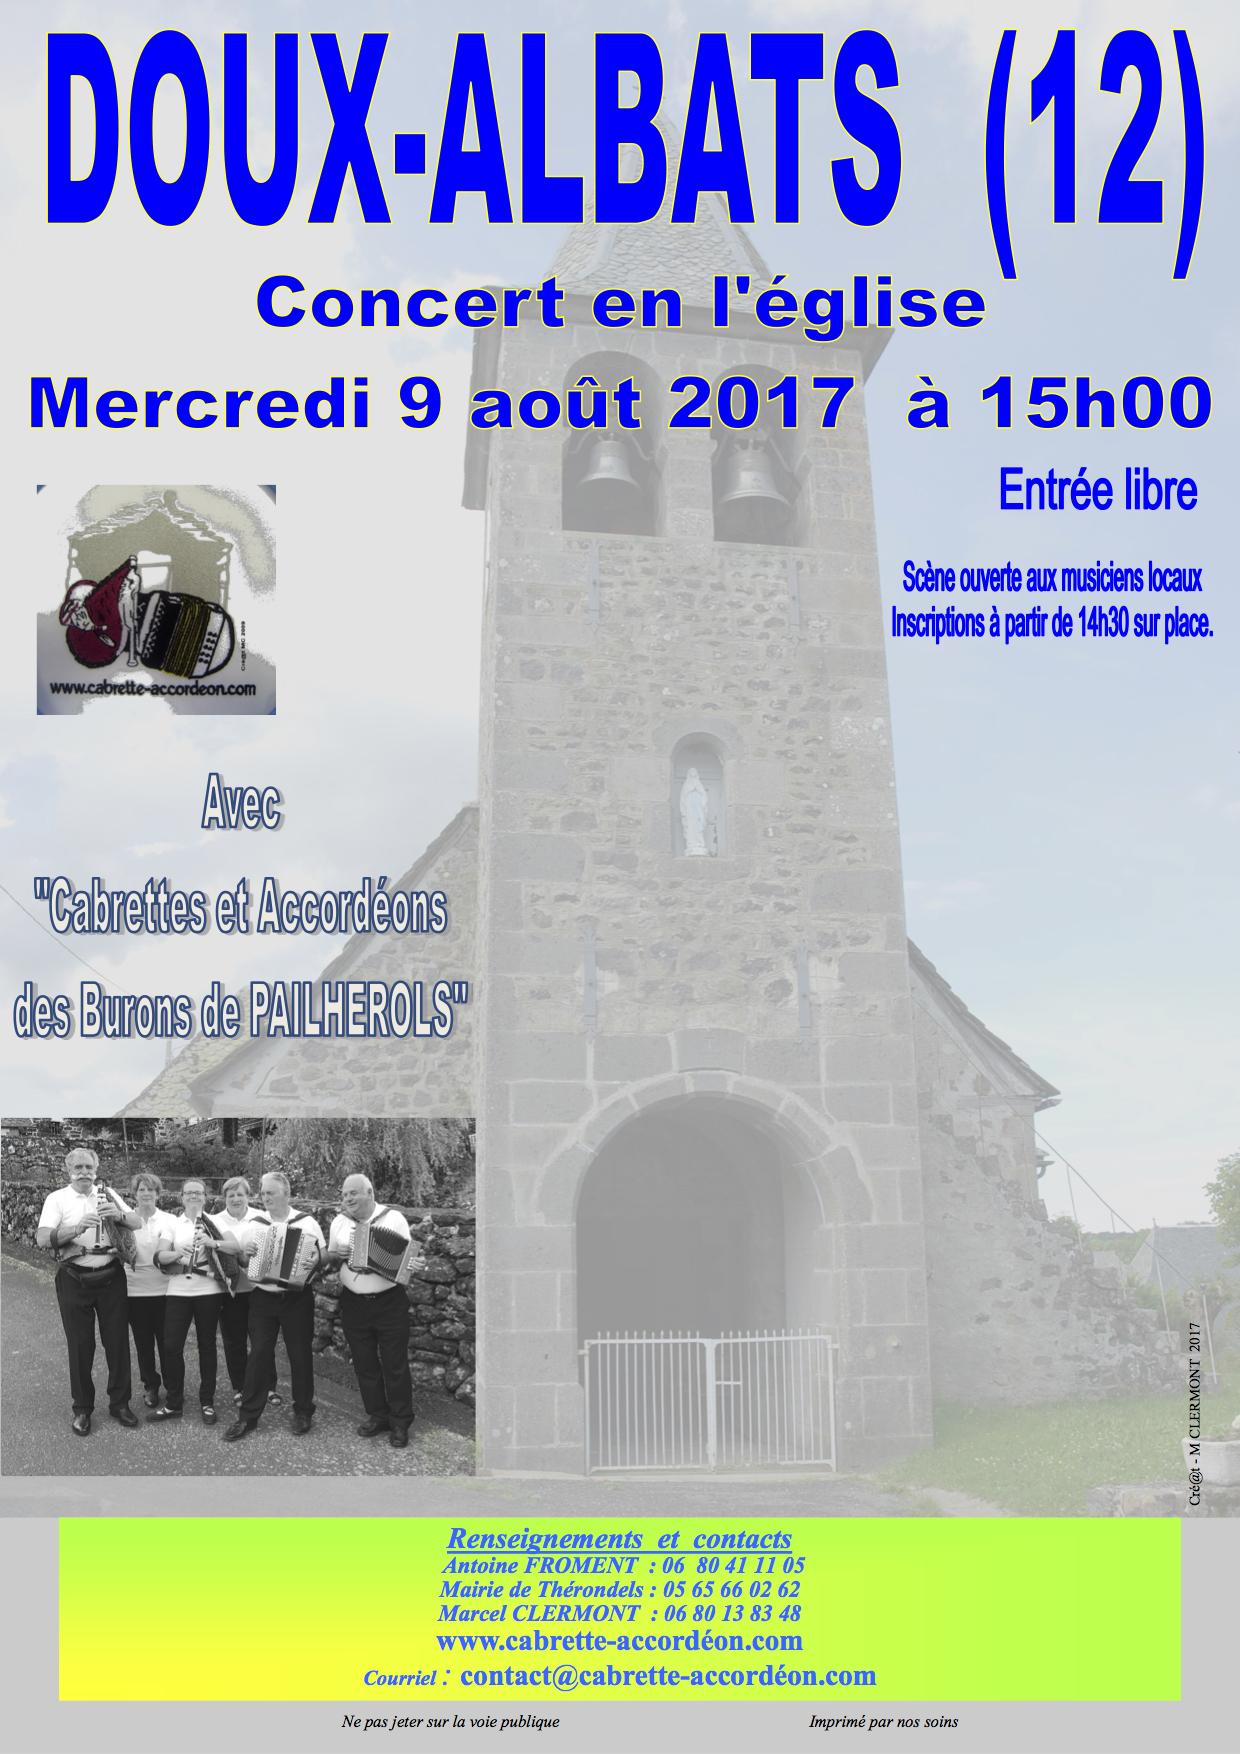 Concert DOUX-ALBATS